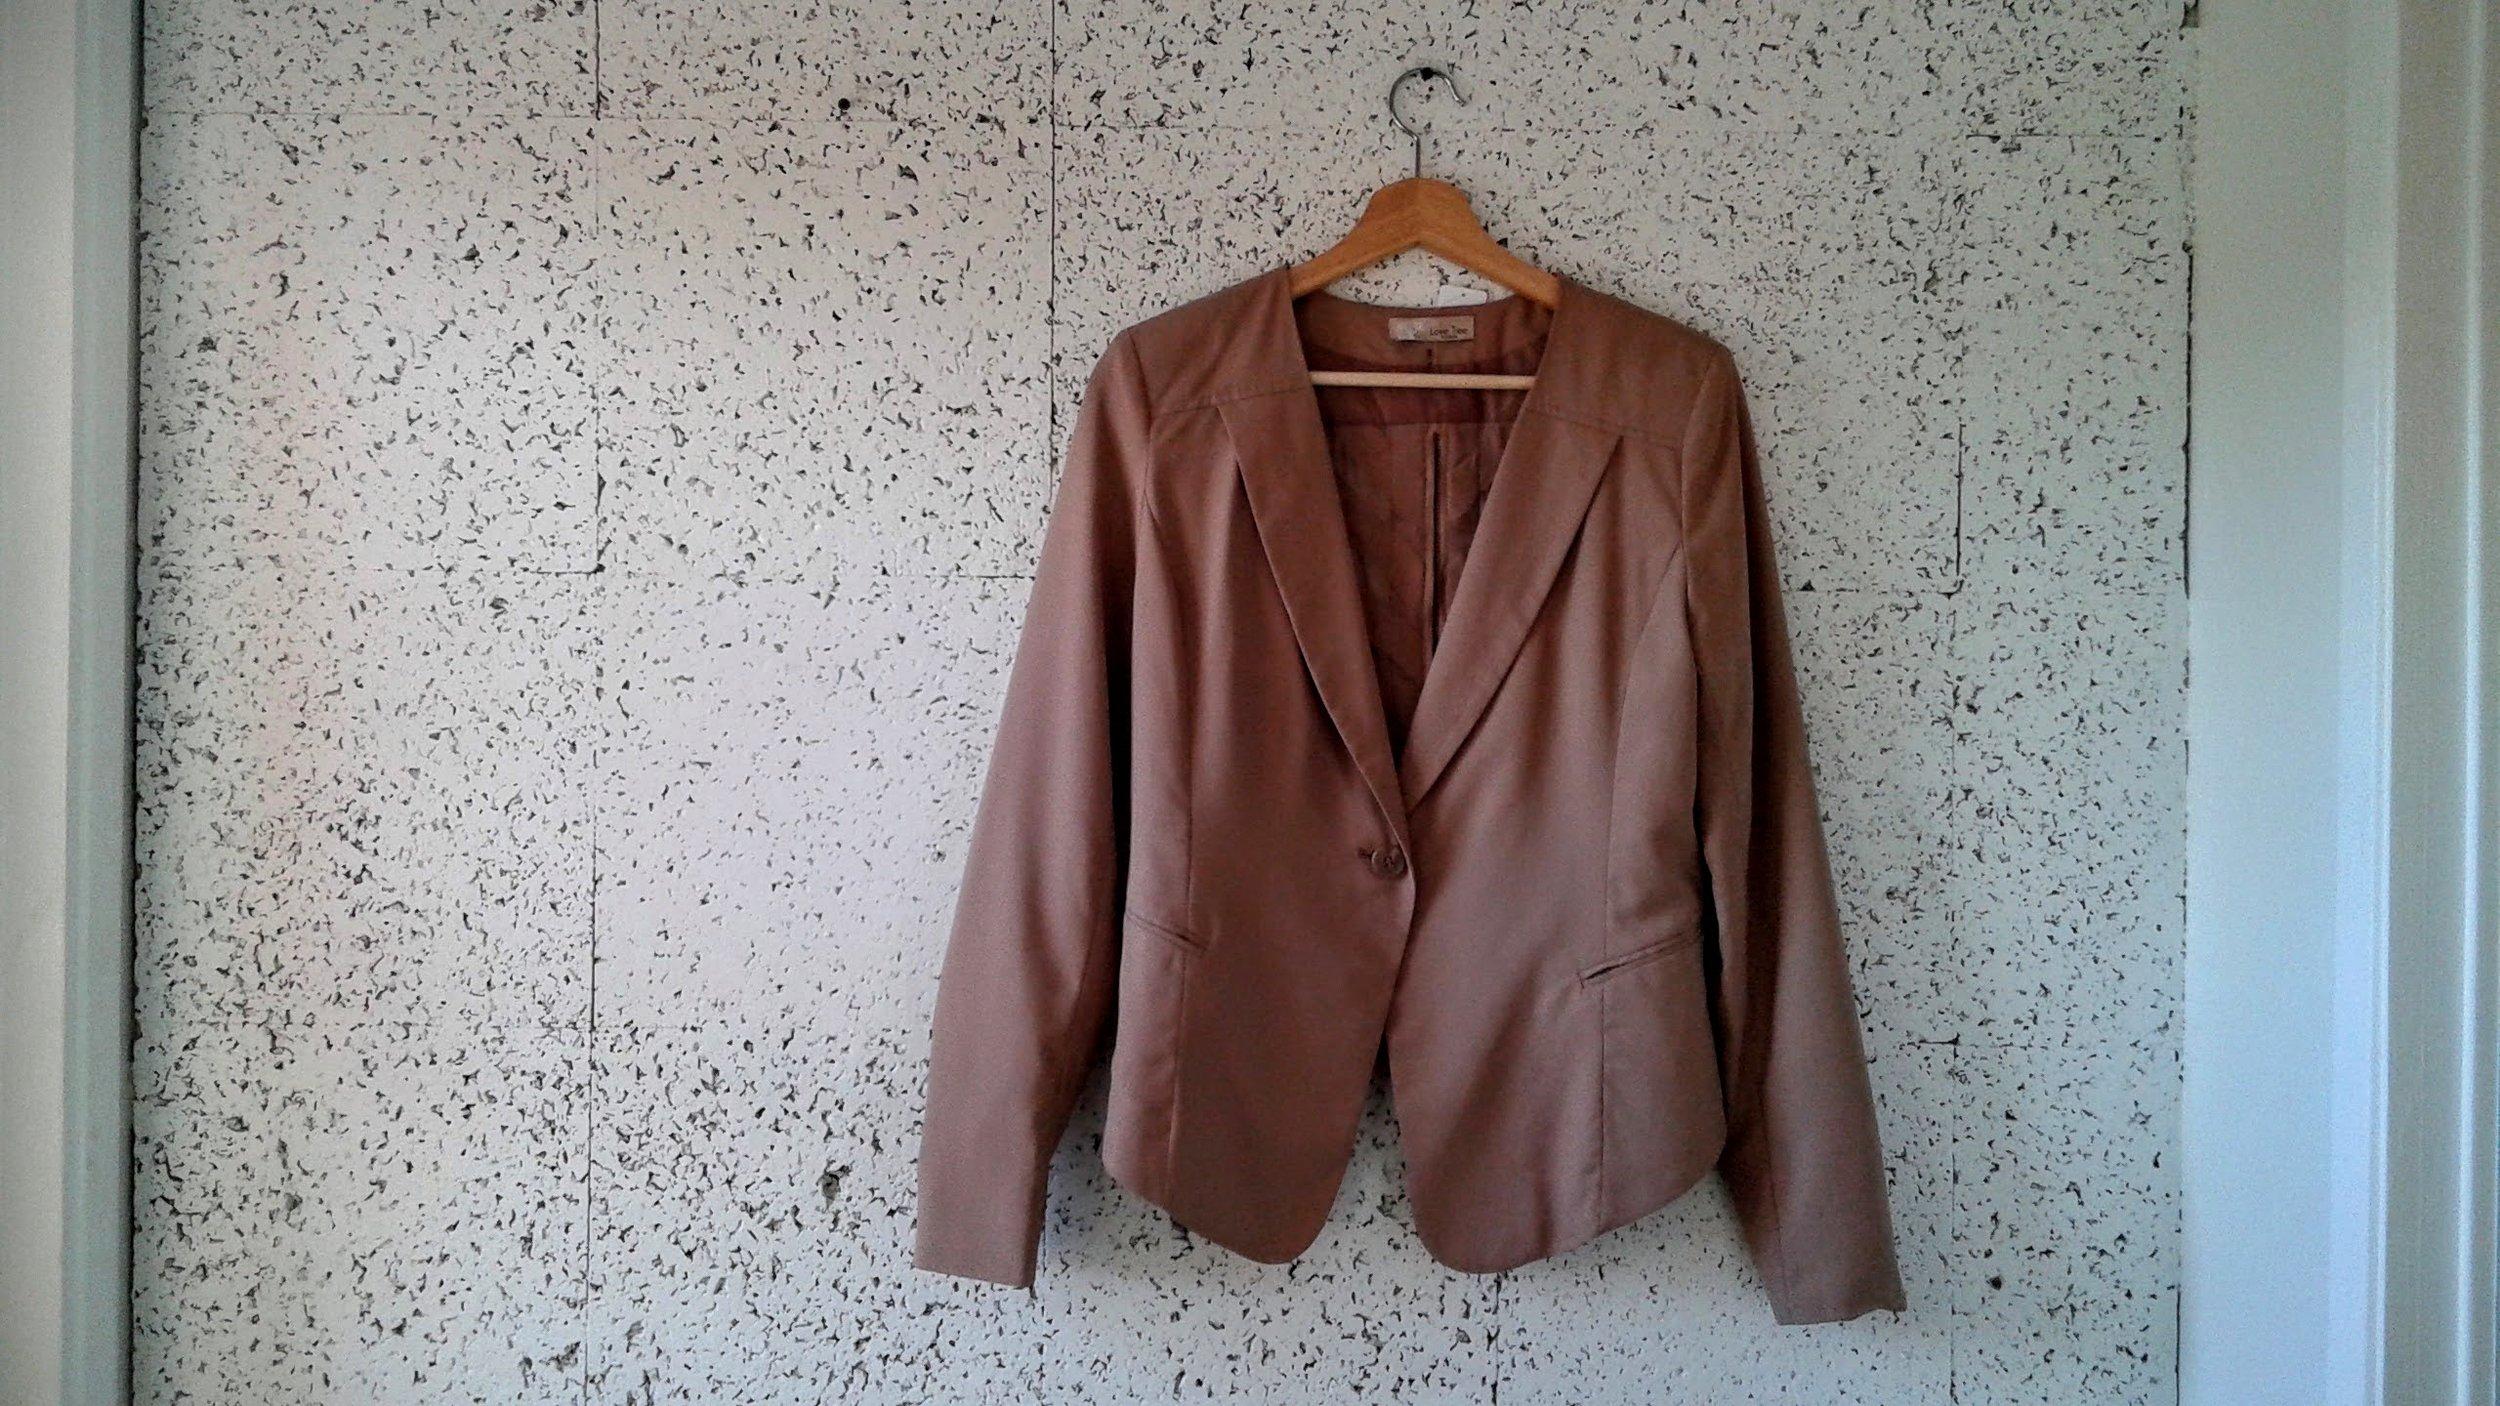 Tree Love  blazer; Size M, $26